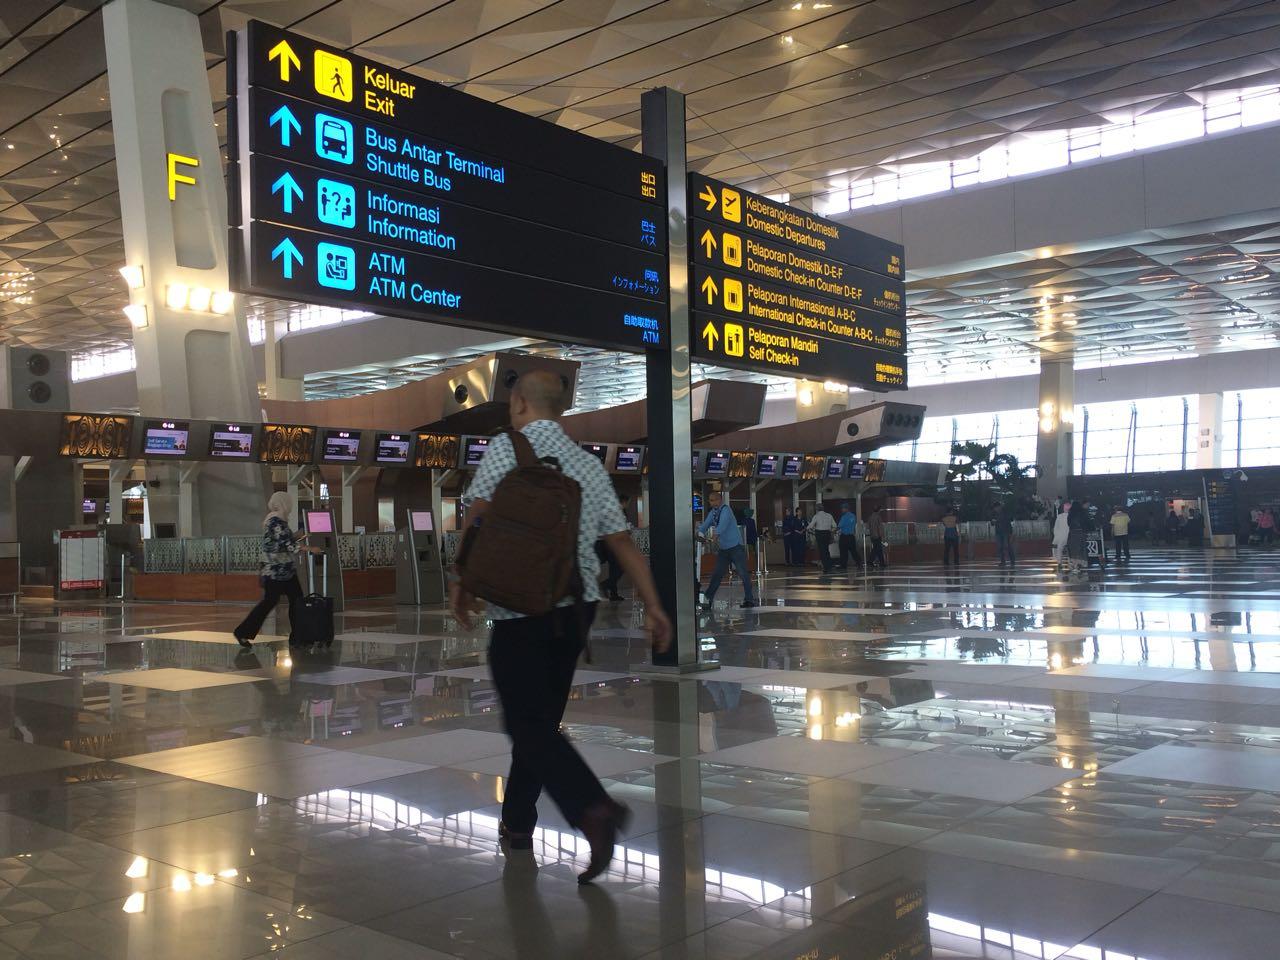 https: img.okezone.com content 2021 05 19 320 2412226 evaluasi-larangan-mudik-74-878-penumpang-terbang-dari-15-bandara-7VqufbS4x1.jpg